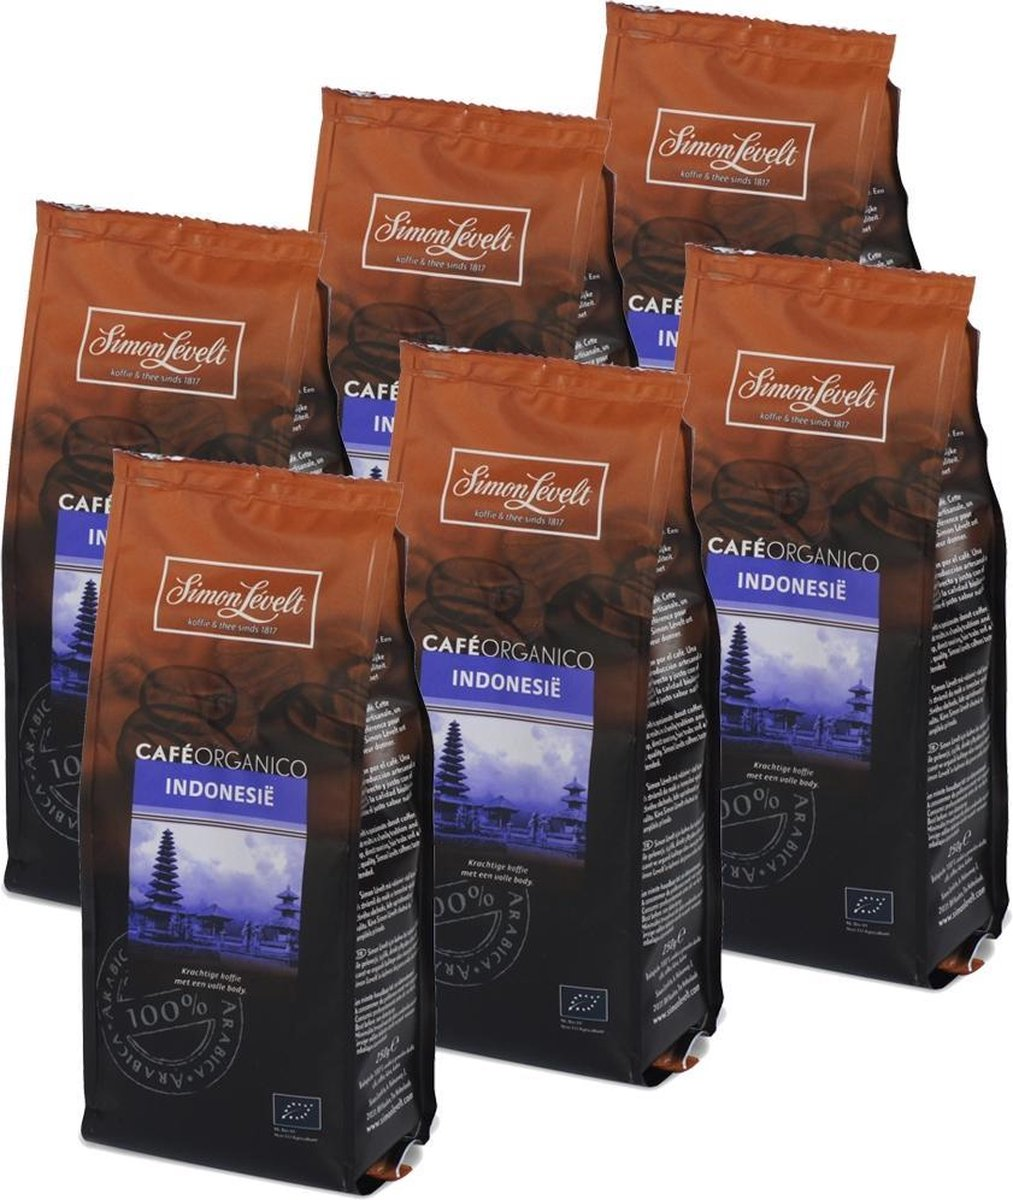 Simon Lévelt Indonesie gemalen koffie - 6 x 250 gram - Simon Lévelt